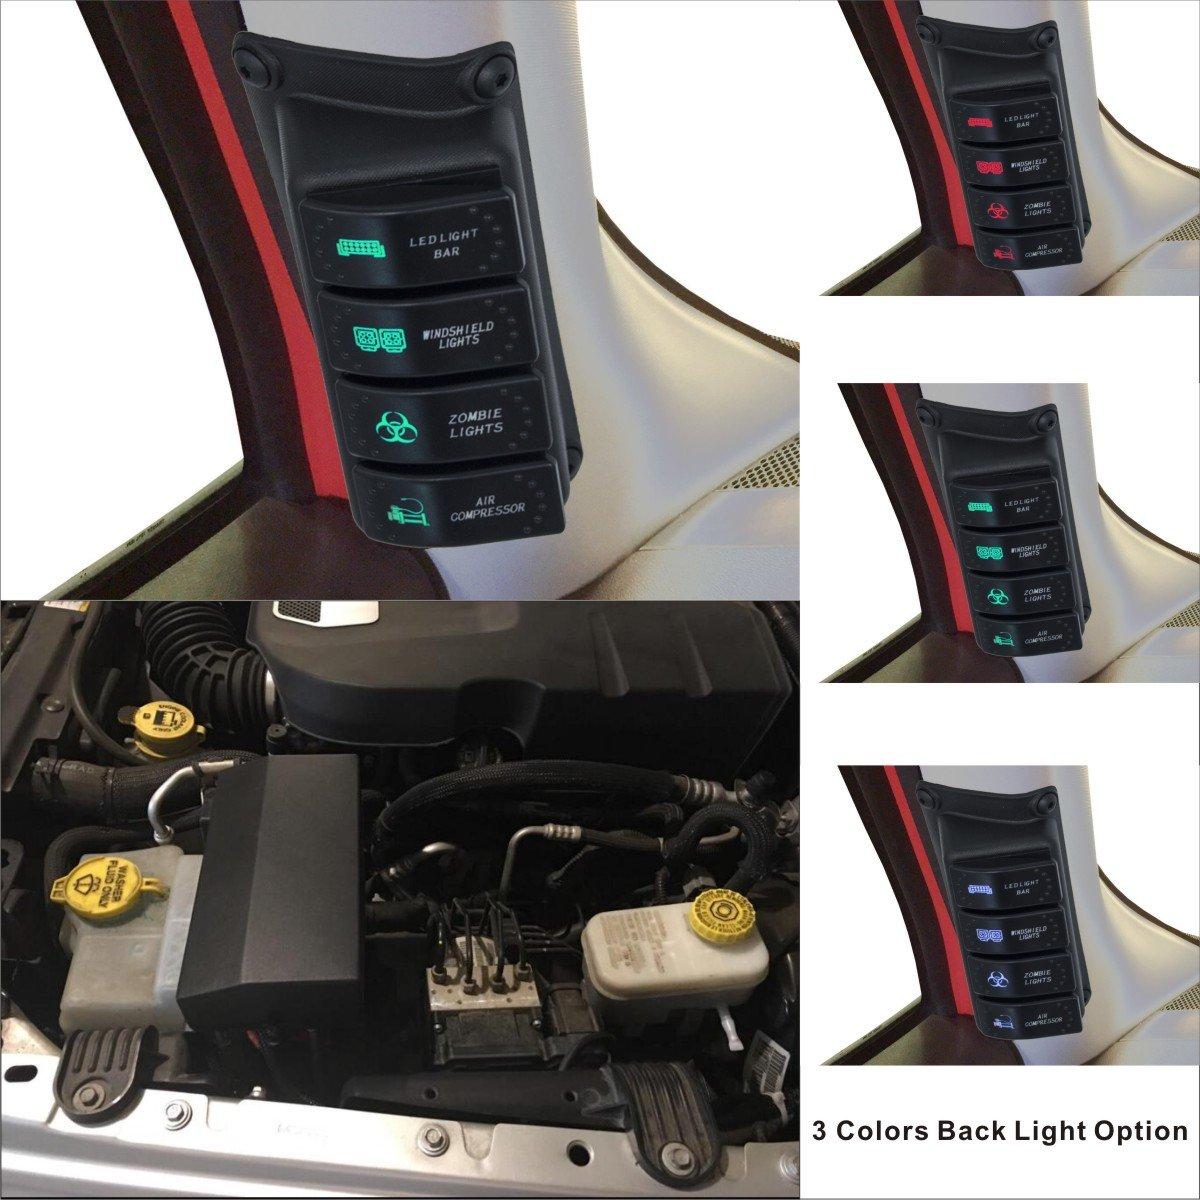 Apollointech Left Side A-Pillar 4-Switch Pod/Panel & Source Control System Fit Jeep Wrangler JK & JKU 2007-2017(Red Back Light)